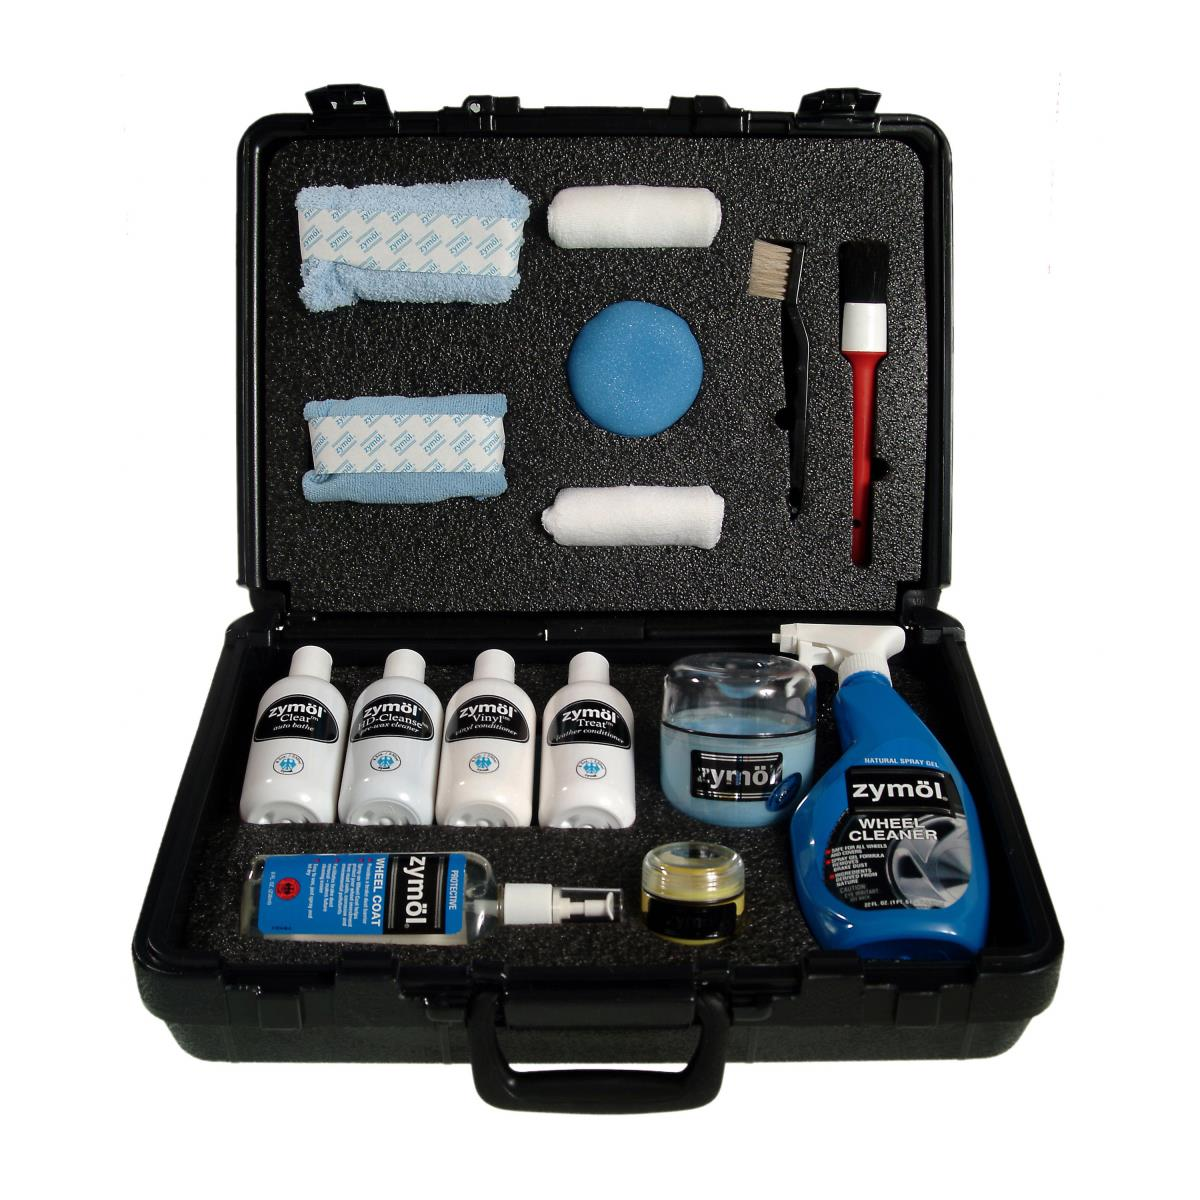 Zymol Complete Kits